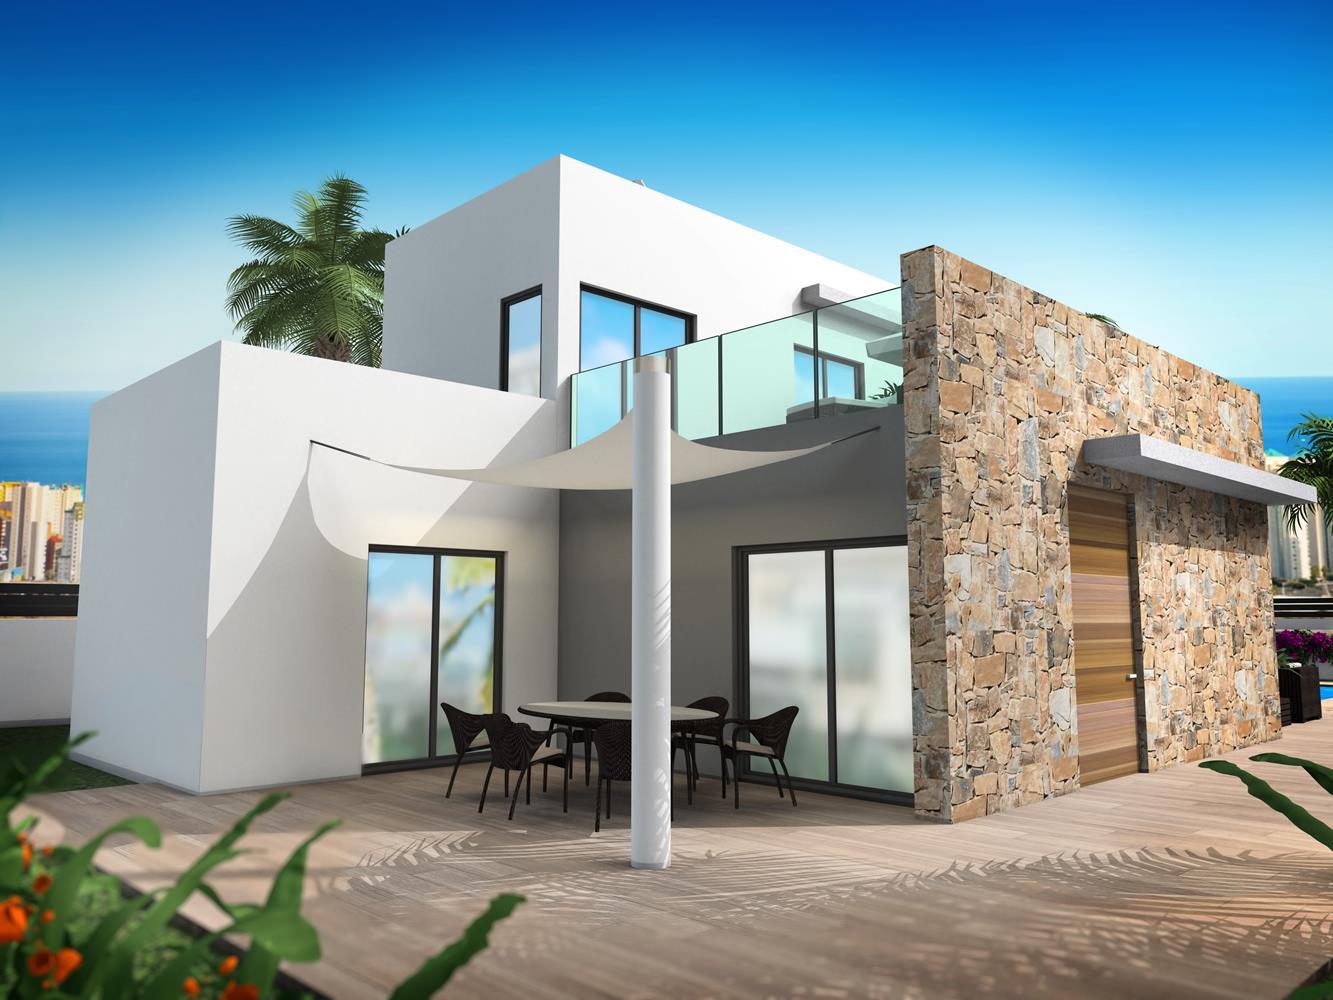 Nieuwbouw villa 39 s finestrat hills spanje specials - Fotos chalets modernos ...